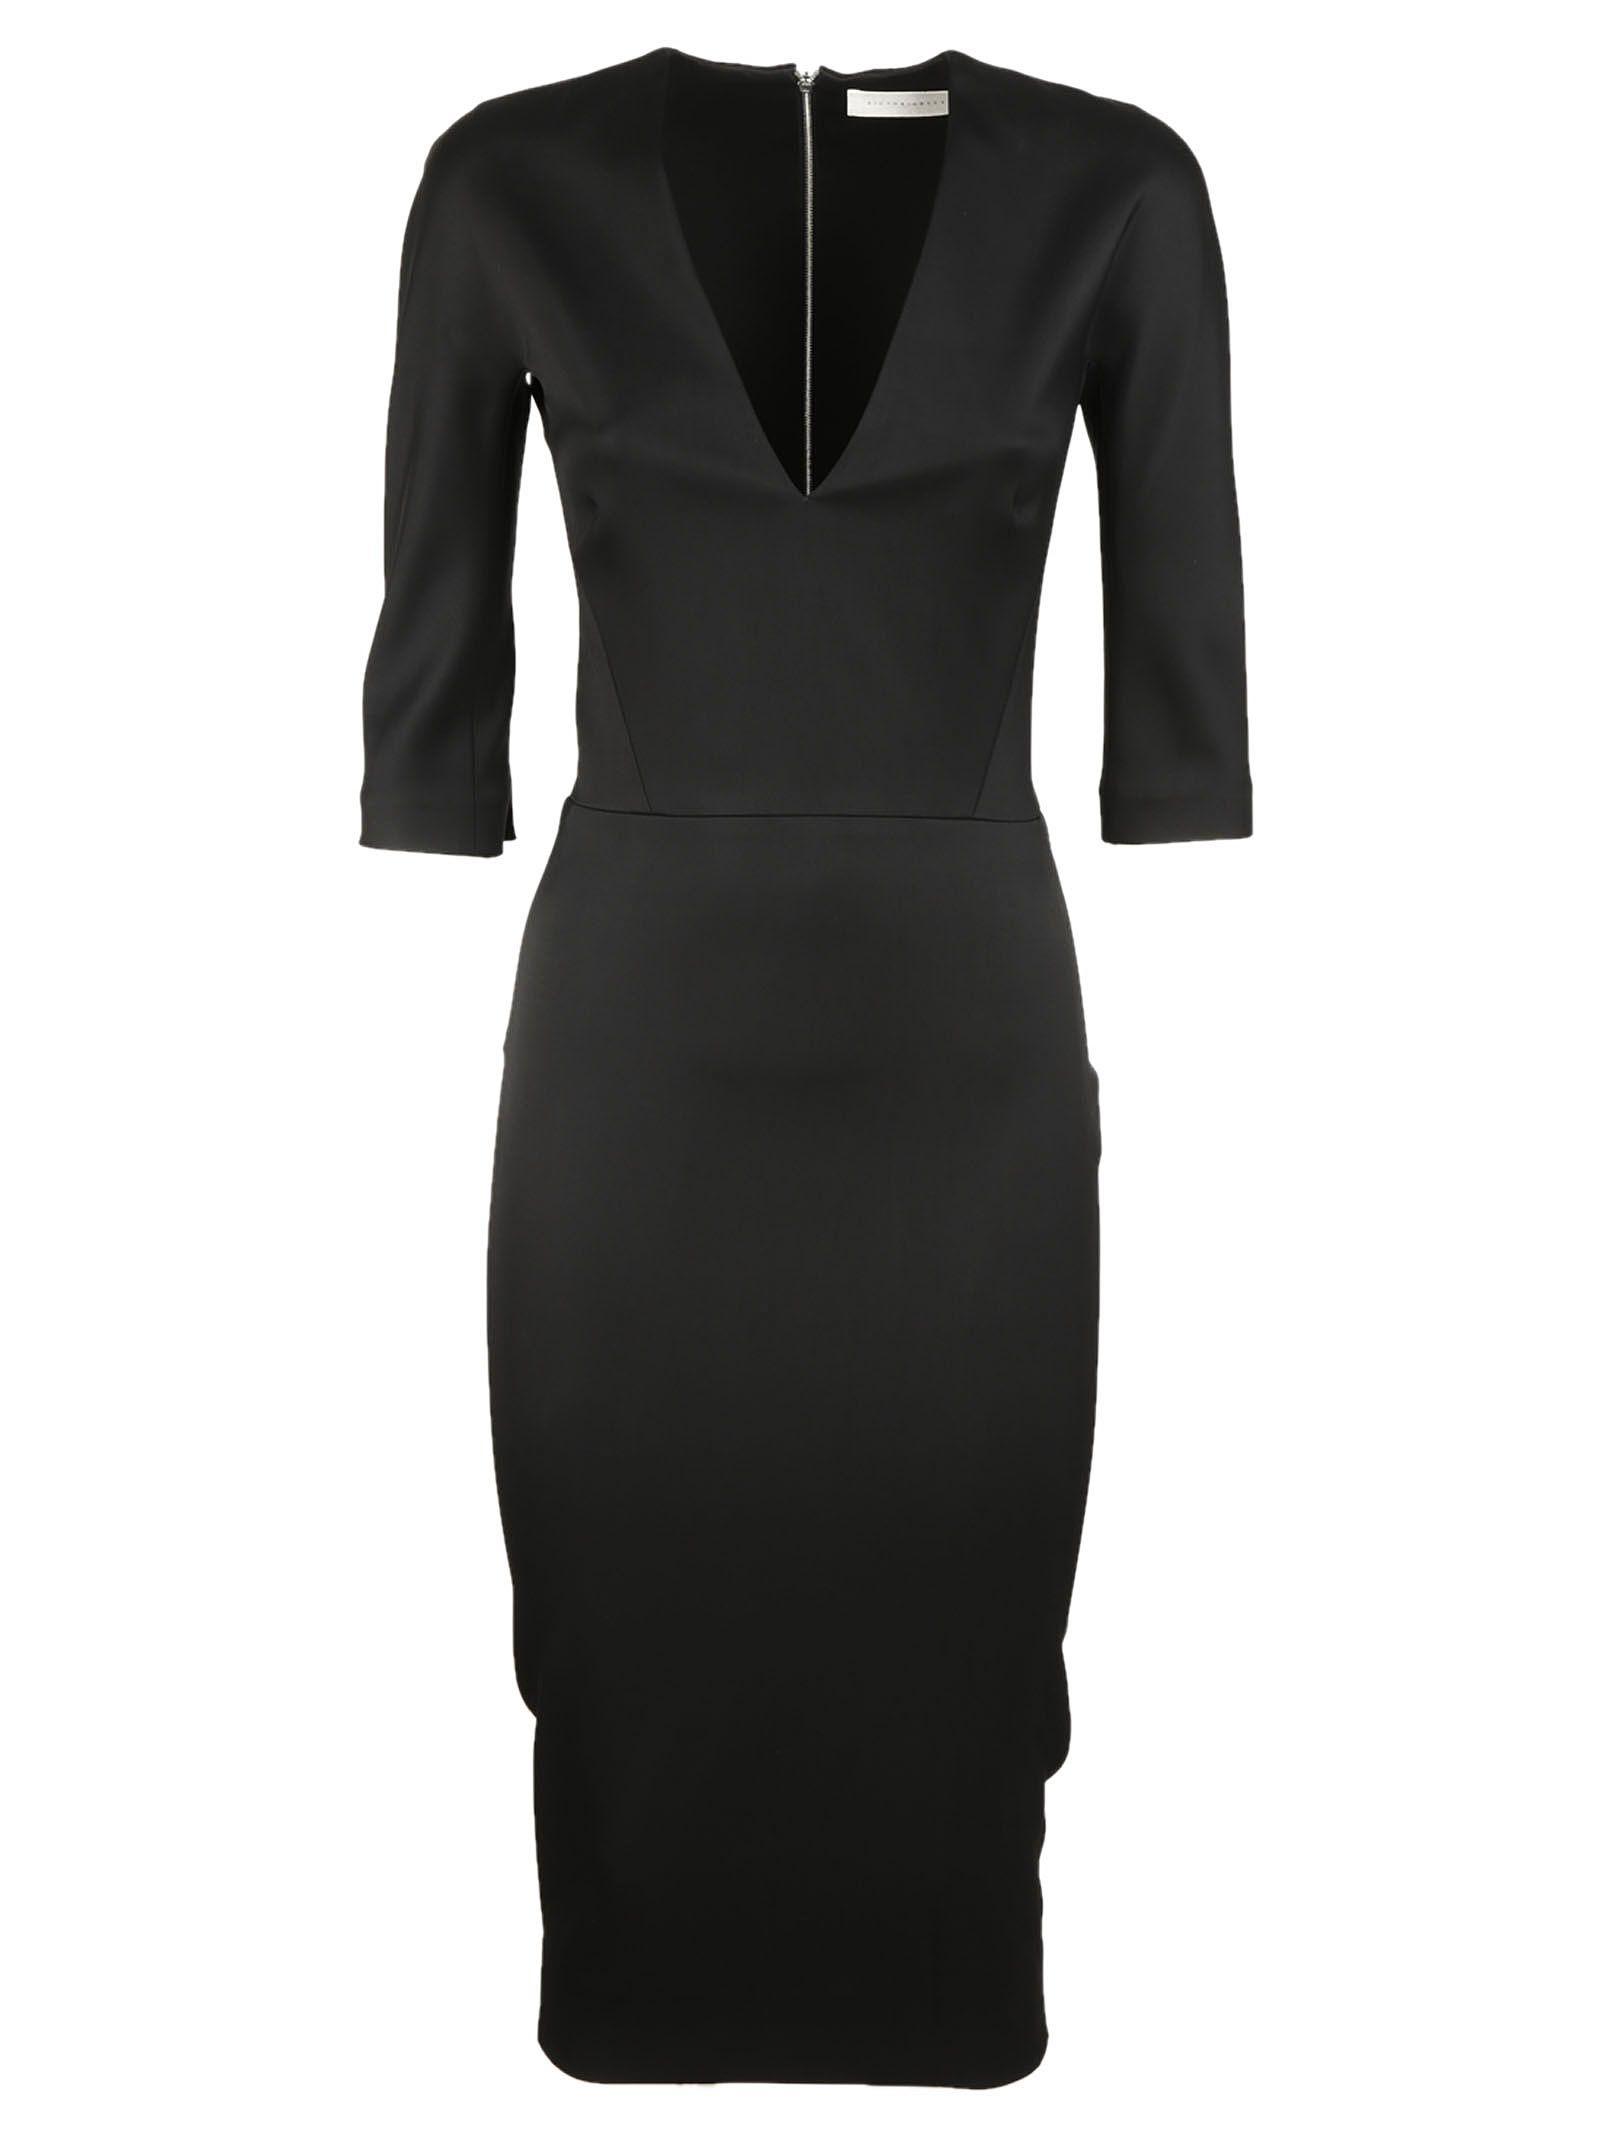 Victoria Beckham V Neck Fitted Dress